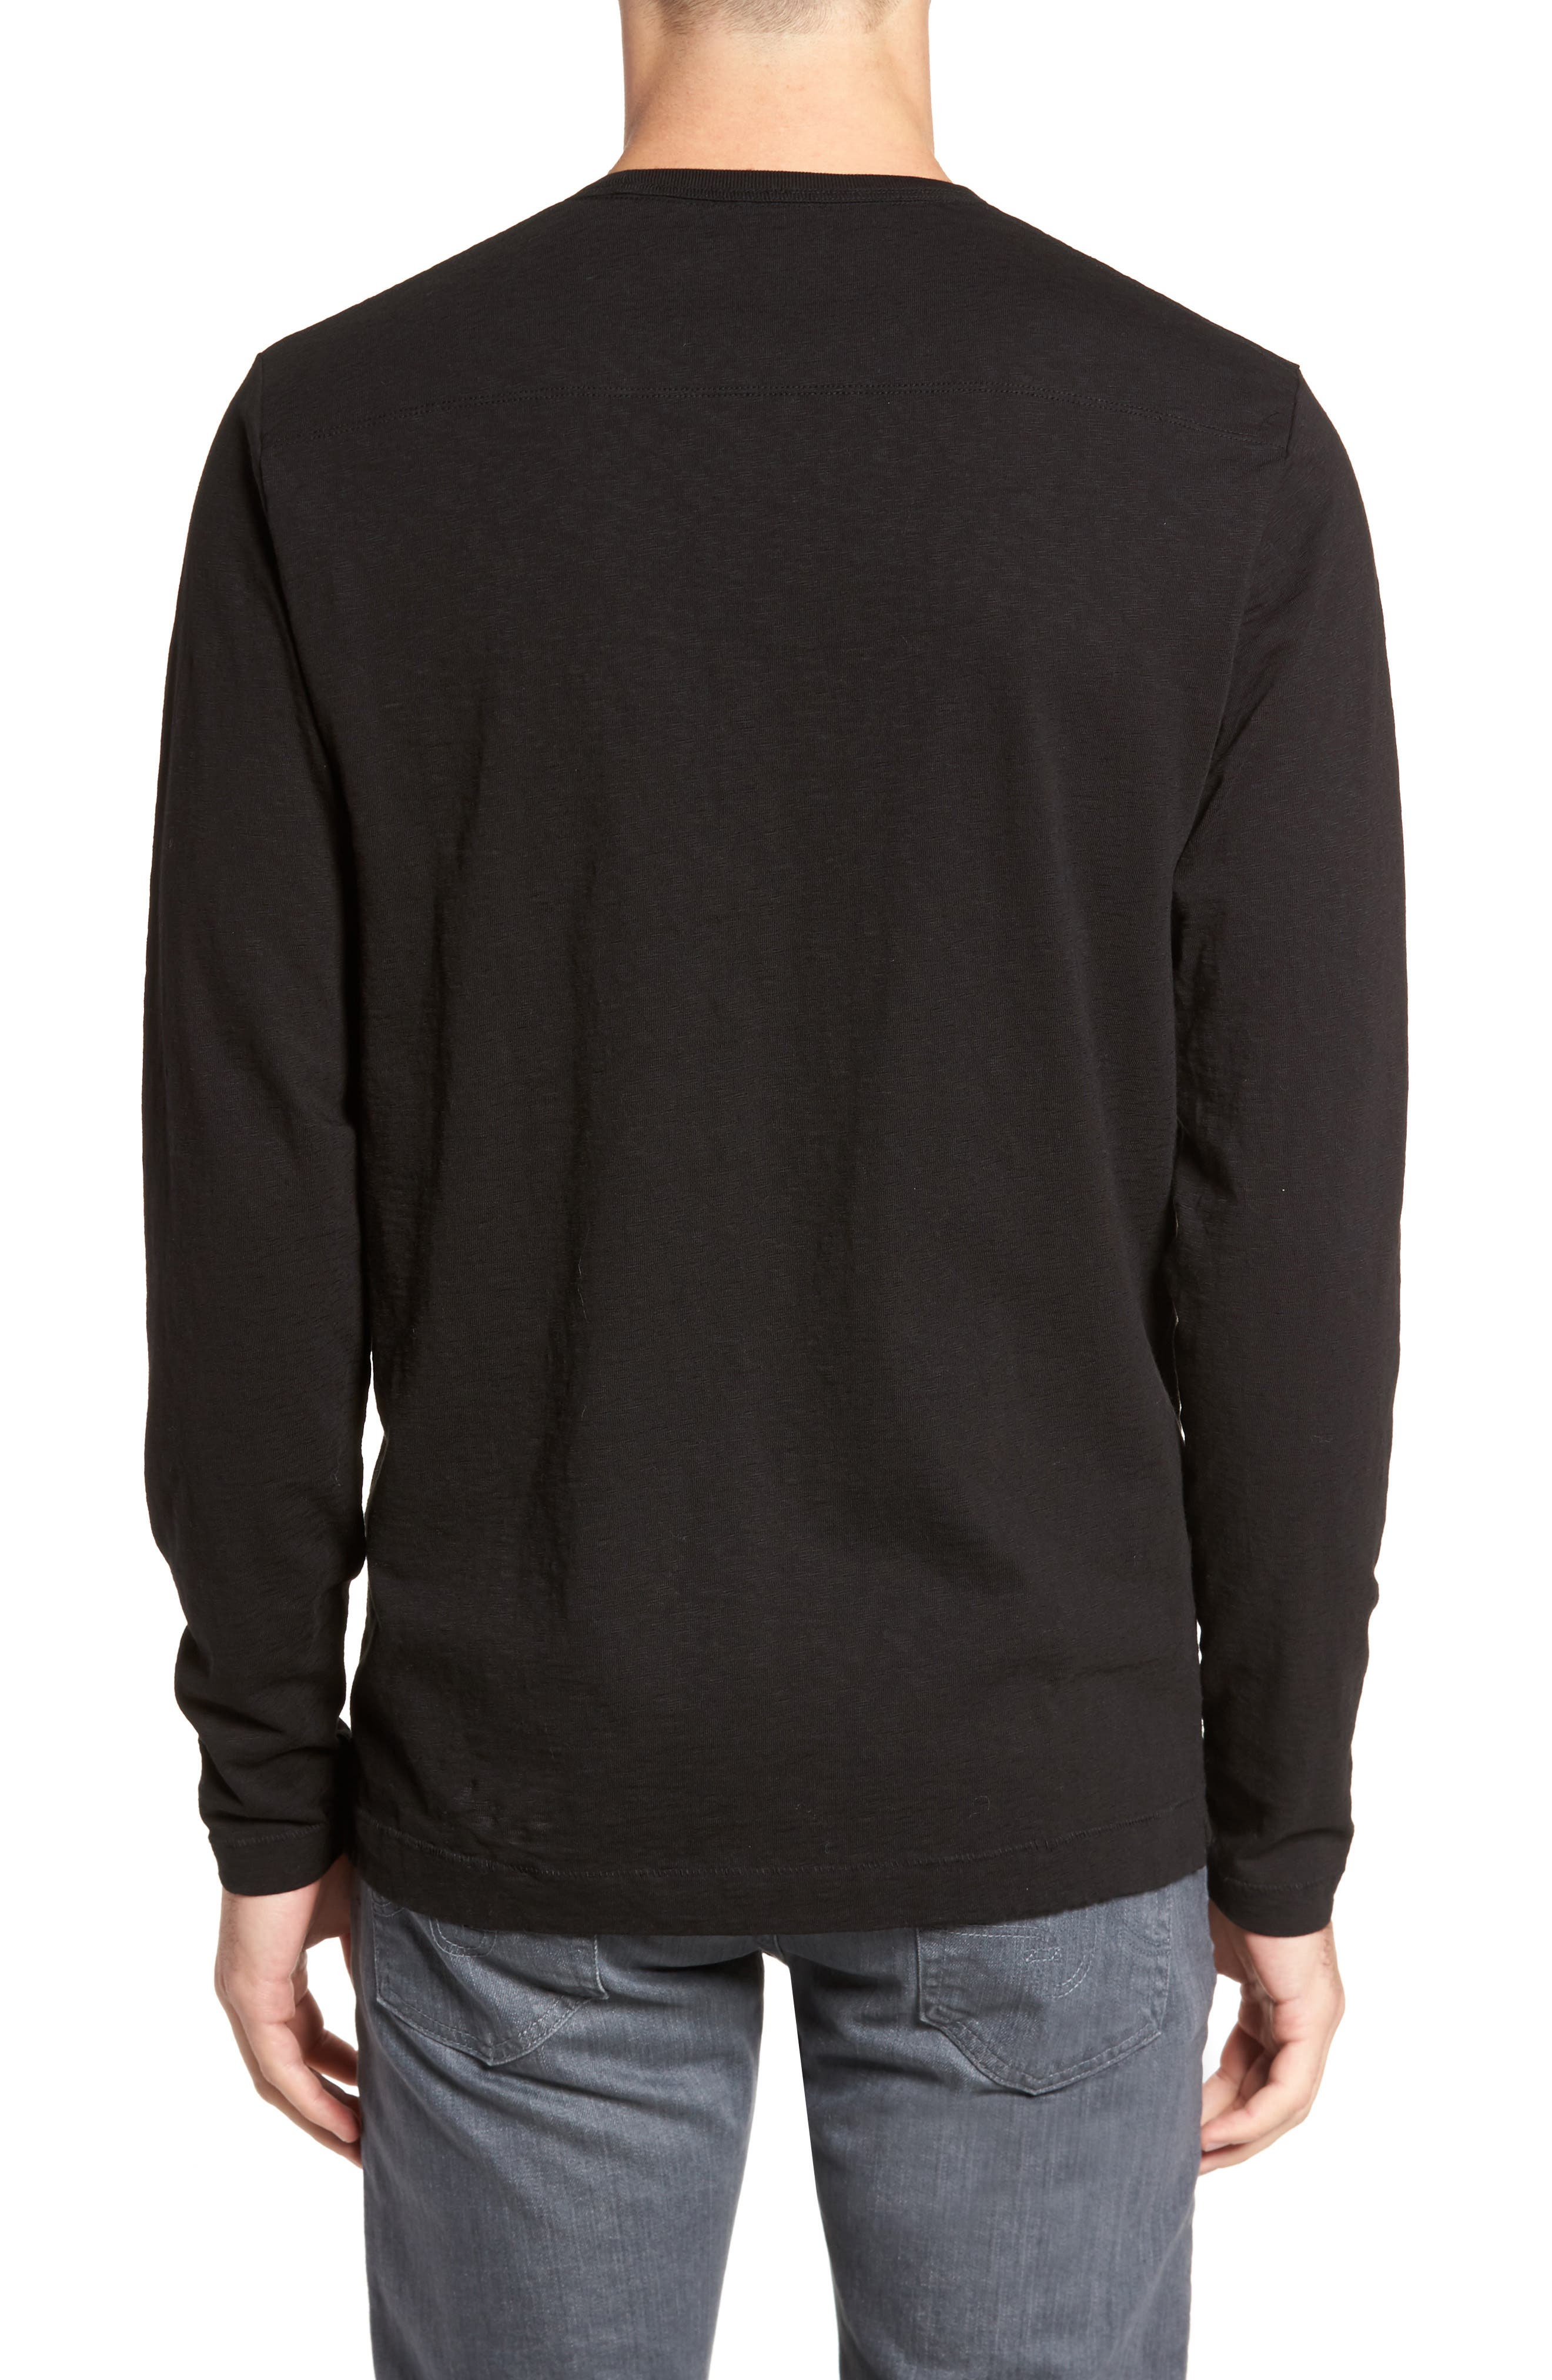 L'Hiver Regular Fit Long Sleeve T-shirt,                             Alternate thumbnail 2, color,                             Black/ Clay